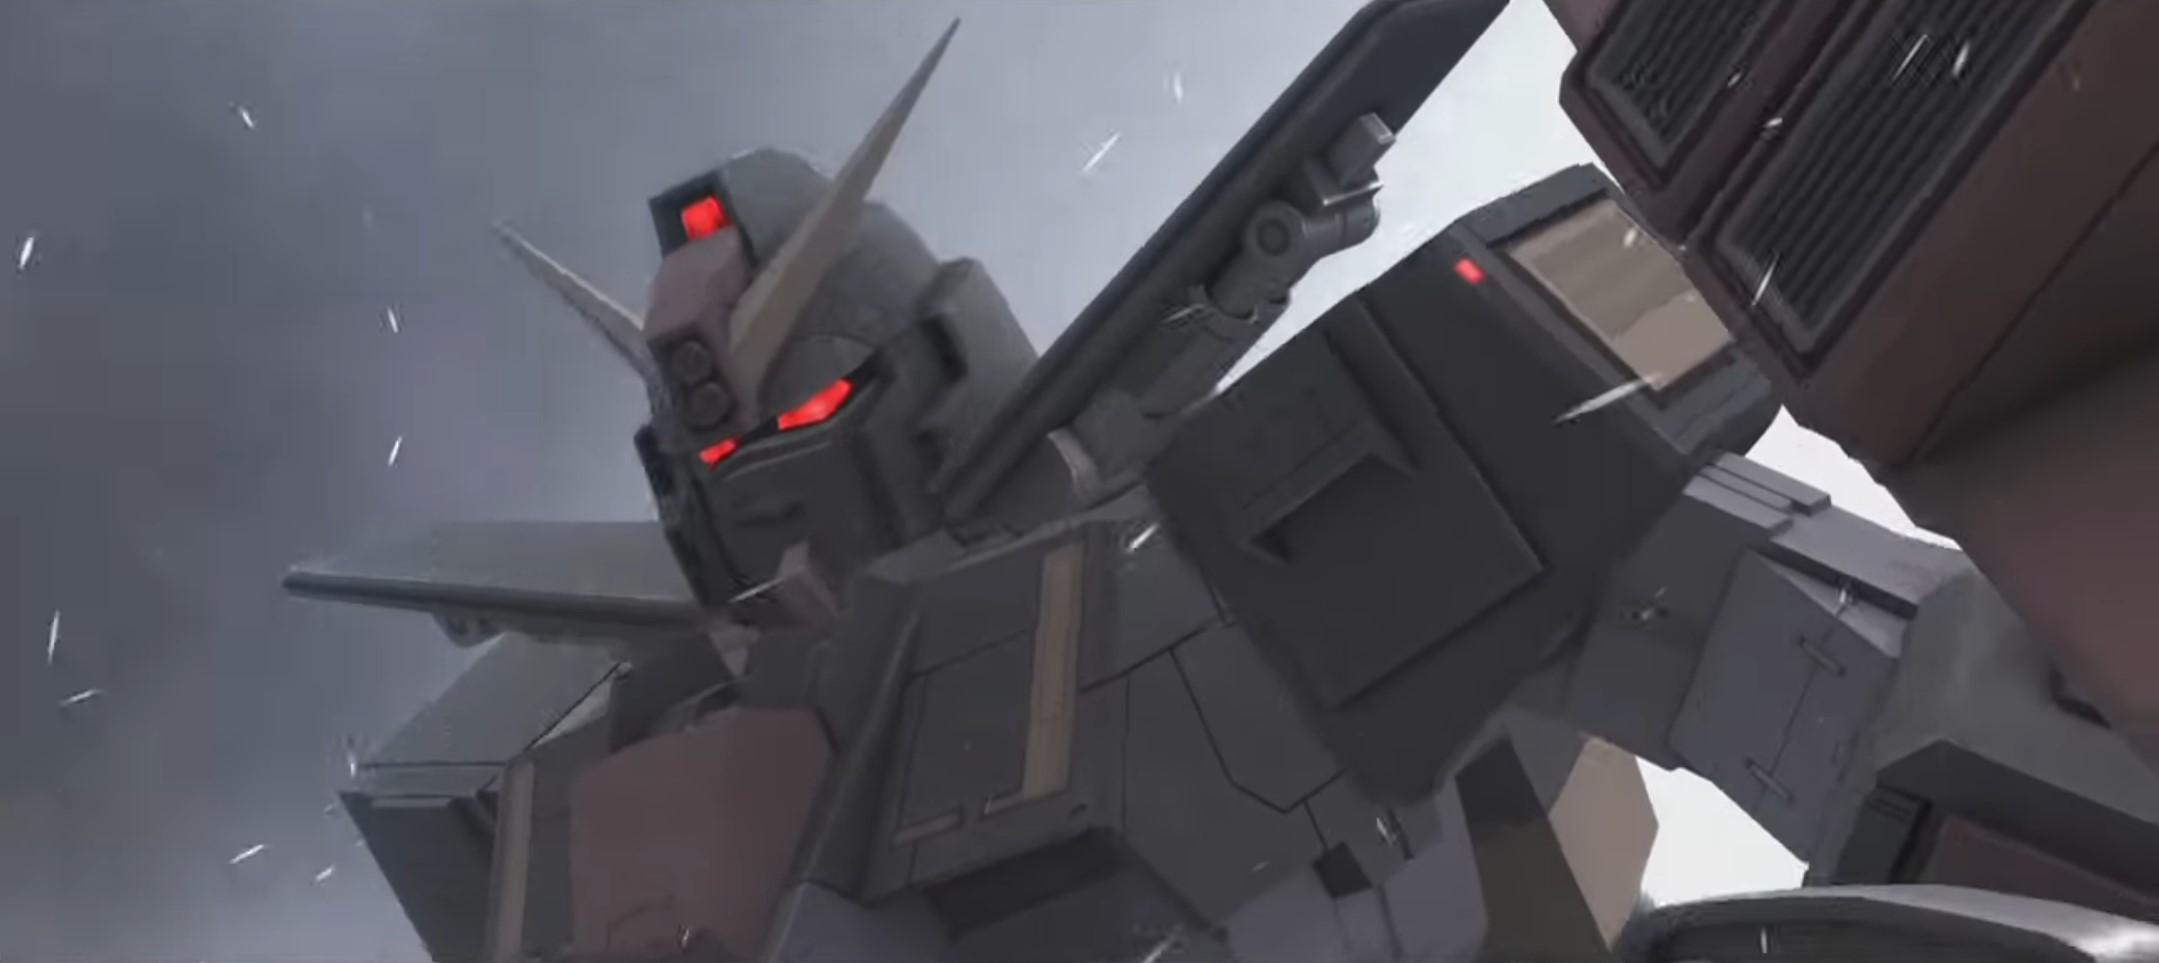 Psyco Gundam terrorizes players in Mobile Suit Gundam: Battle Operation 2's new mode screenshot